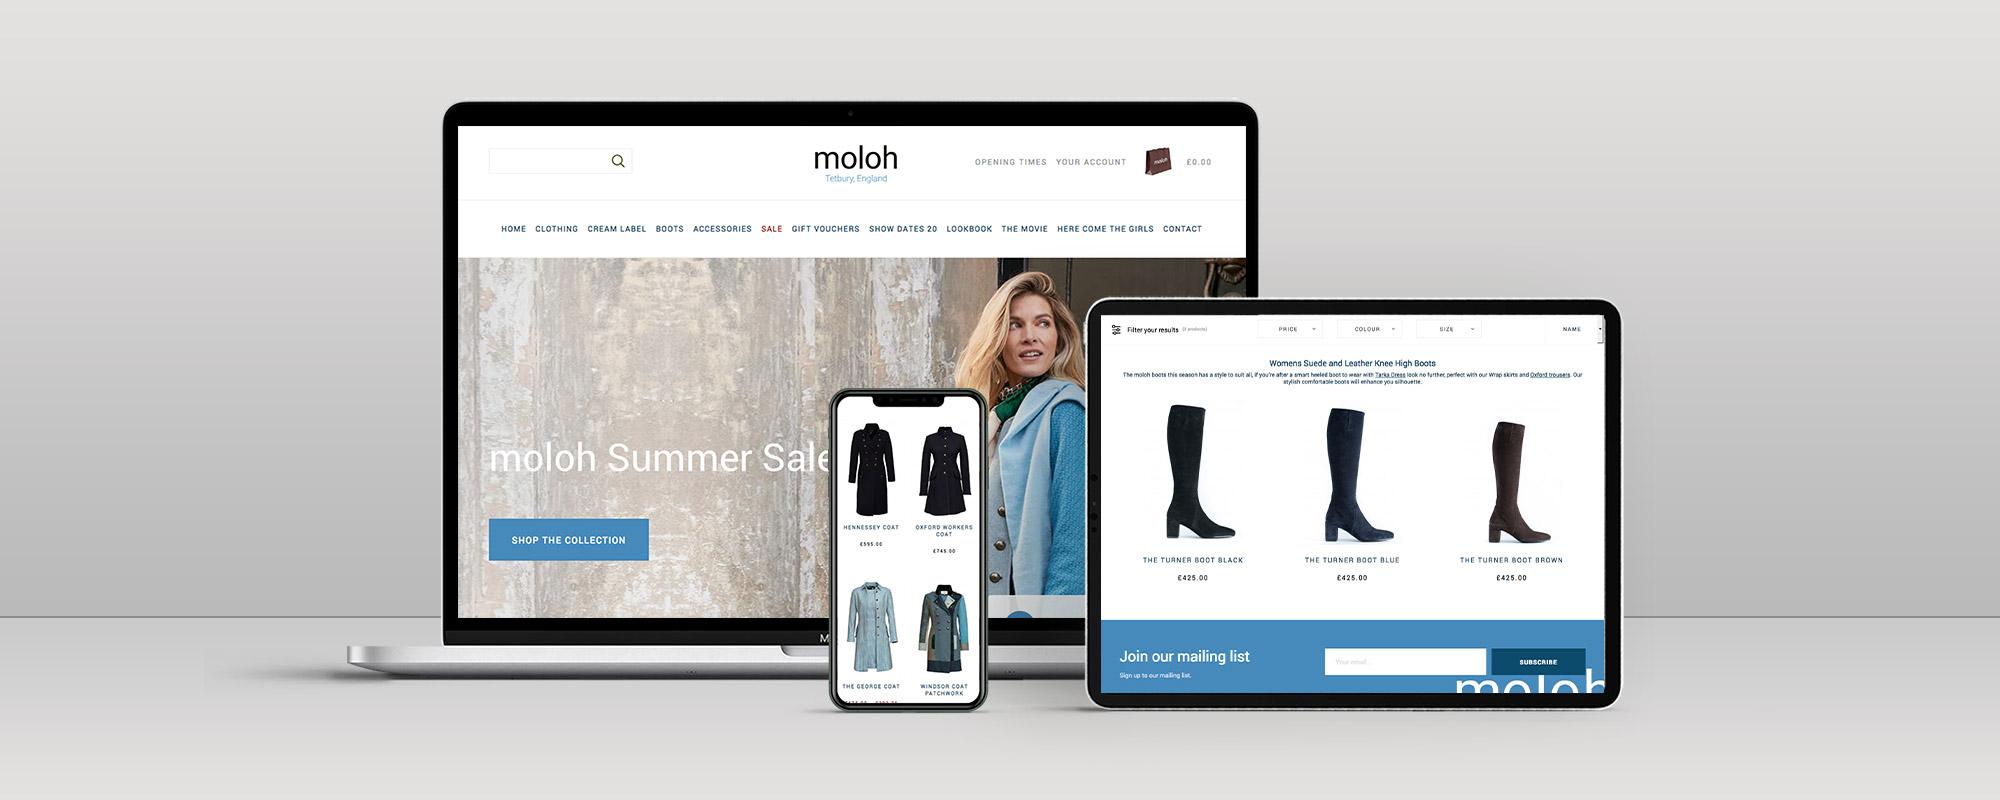 Moloh Magento Website Design on 3 Devices